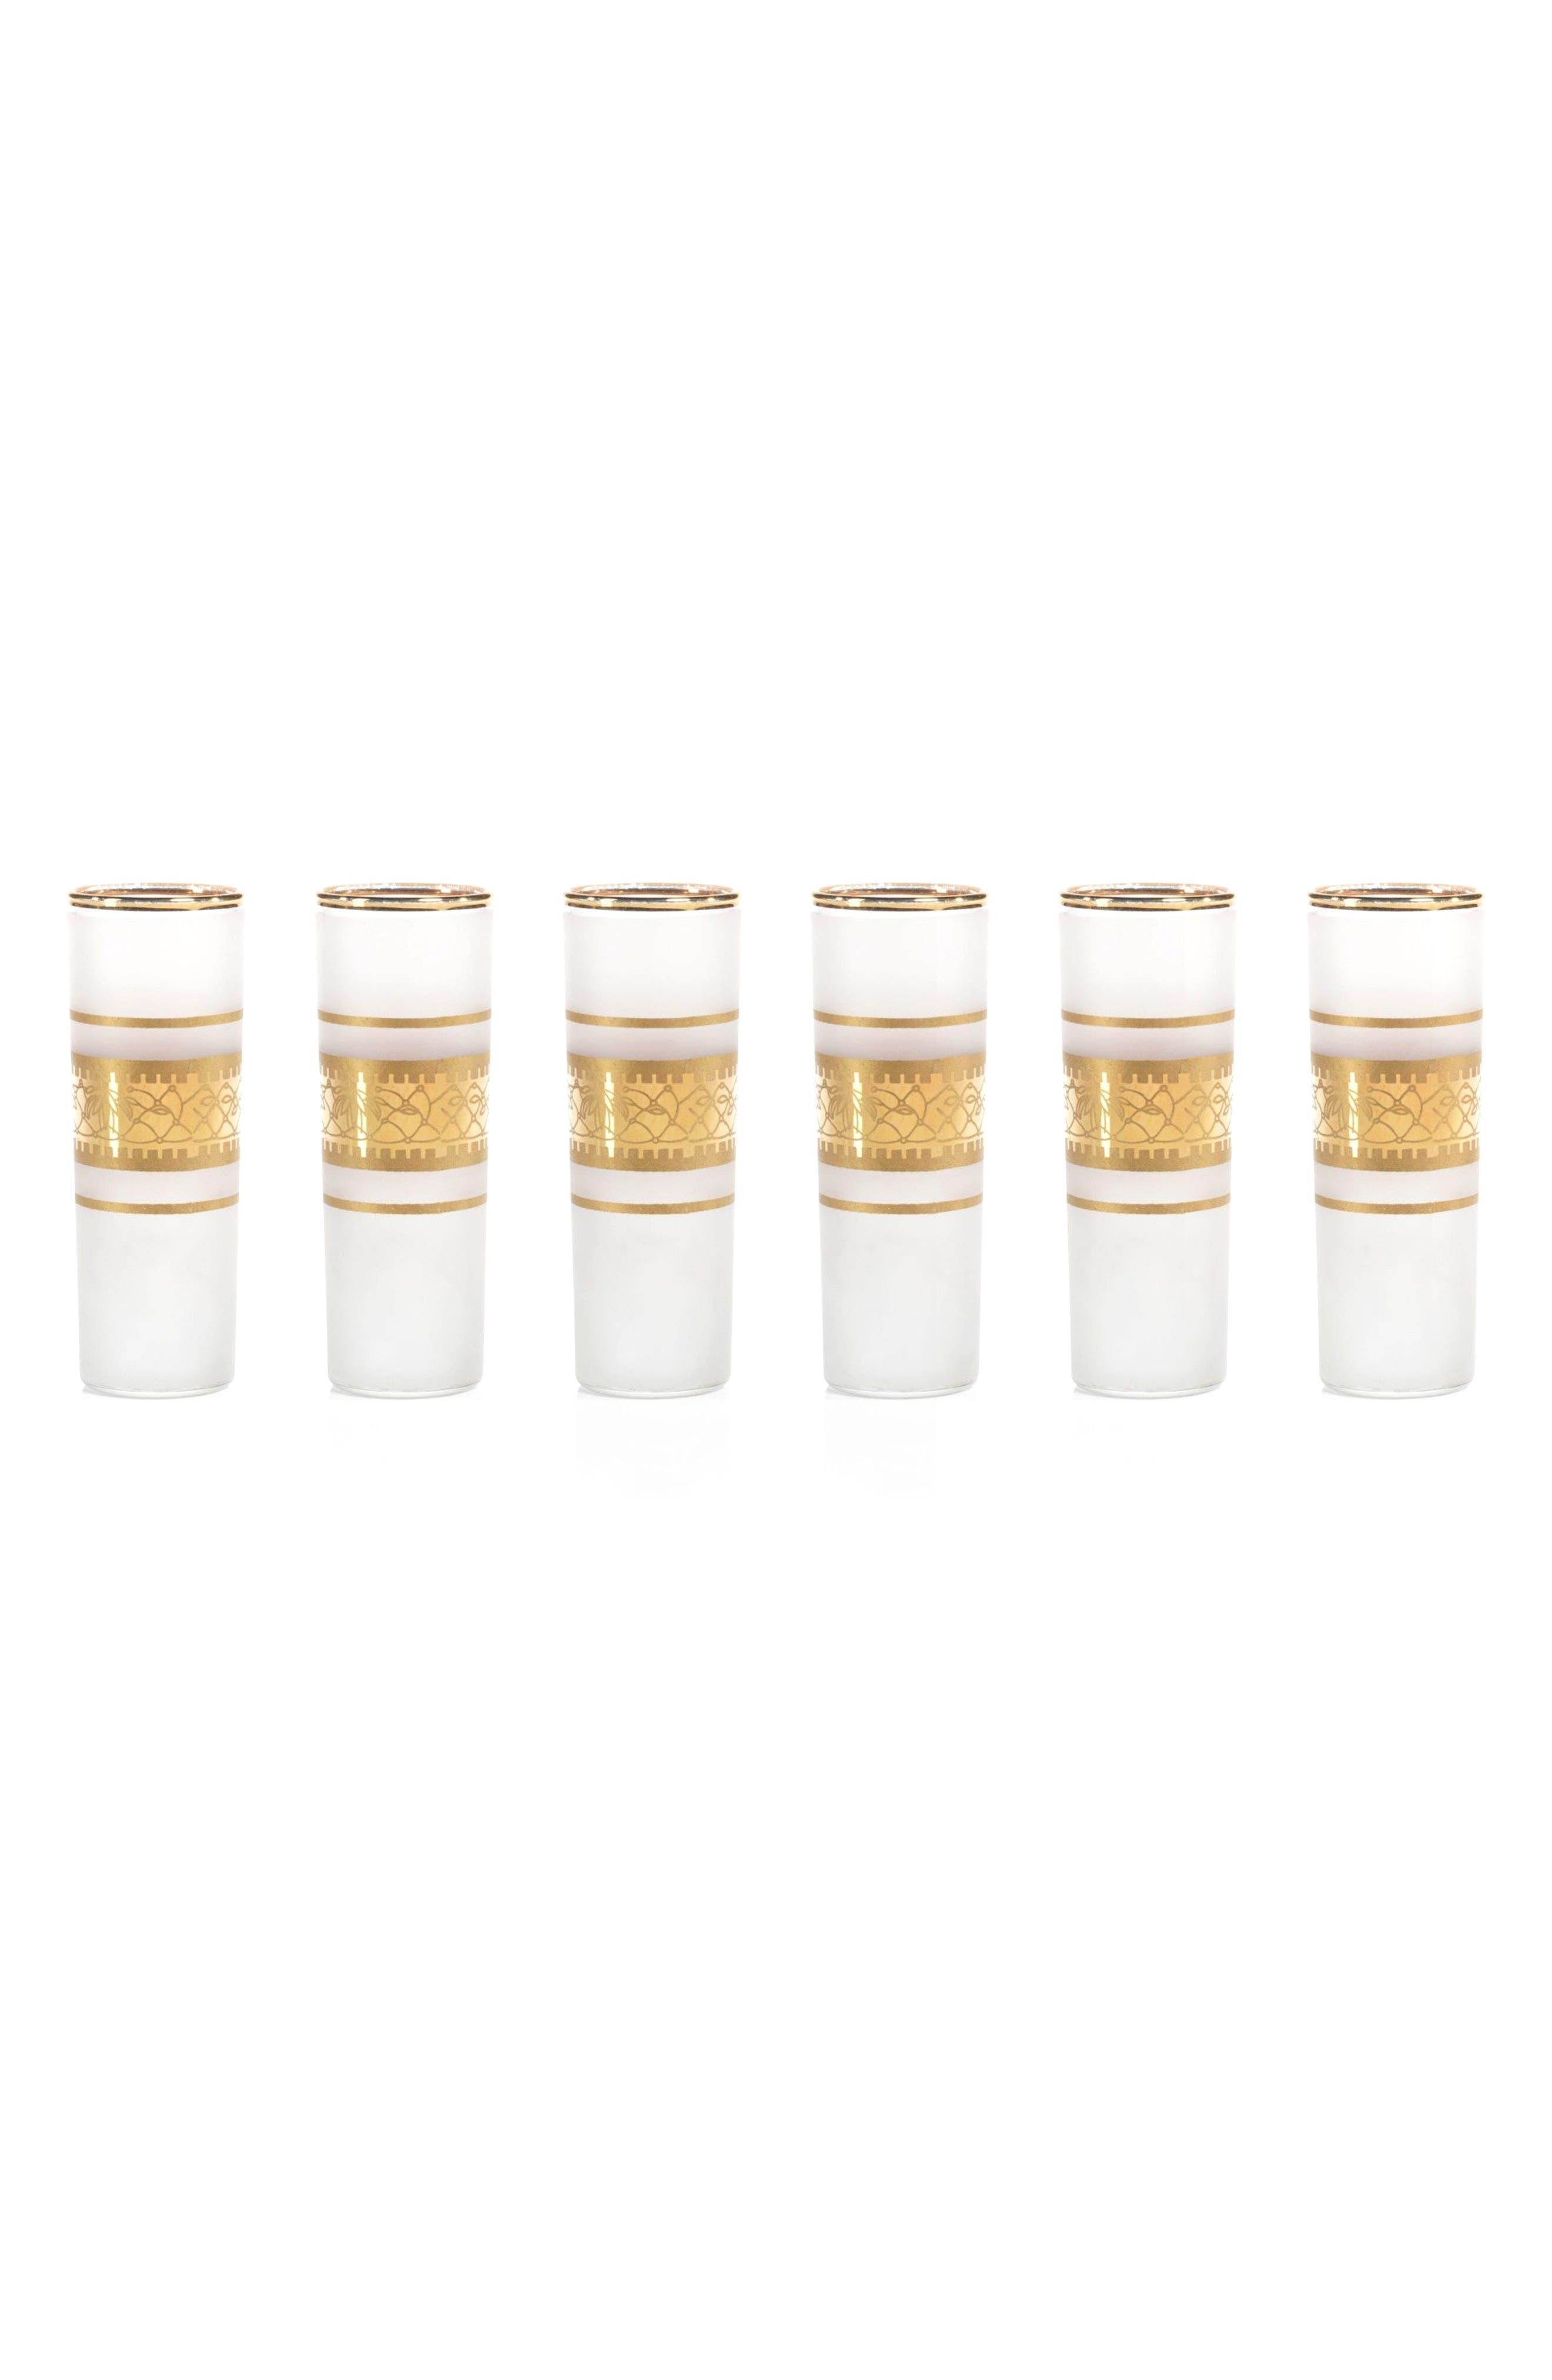 Melilla Set of 6 Shot Glasses,                             Main thumbnail 1, color,                             710